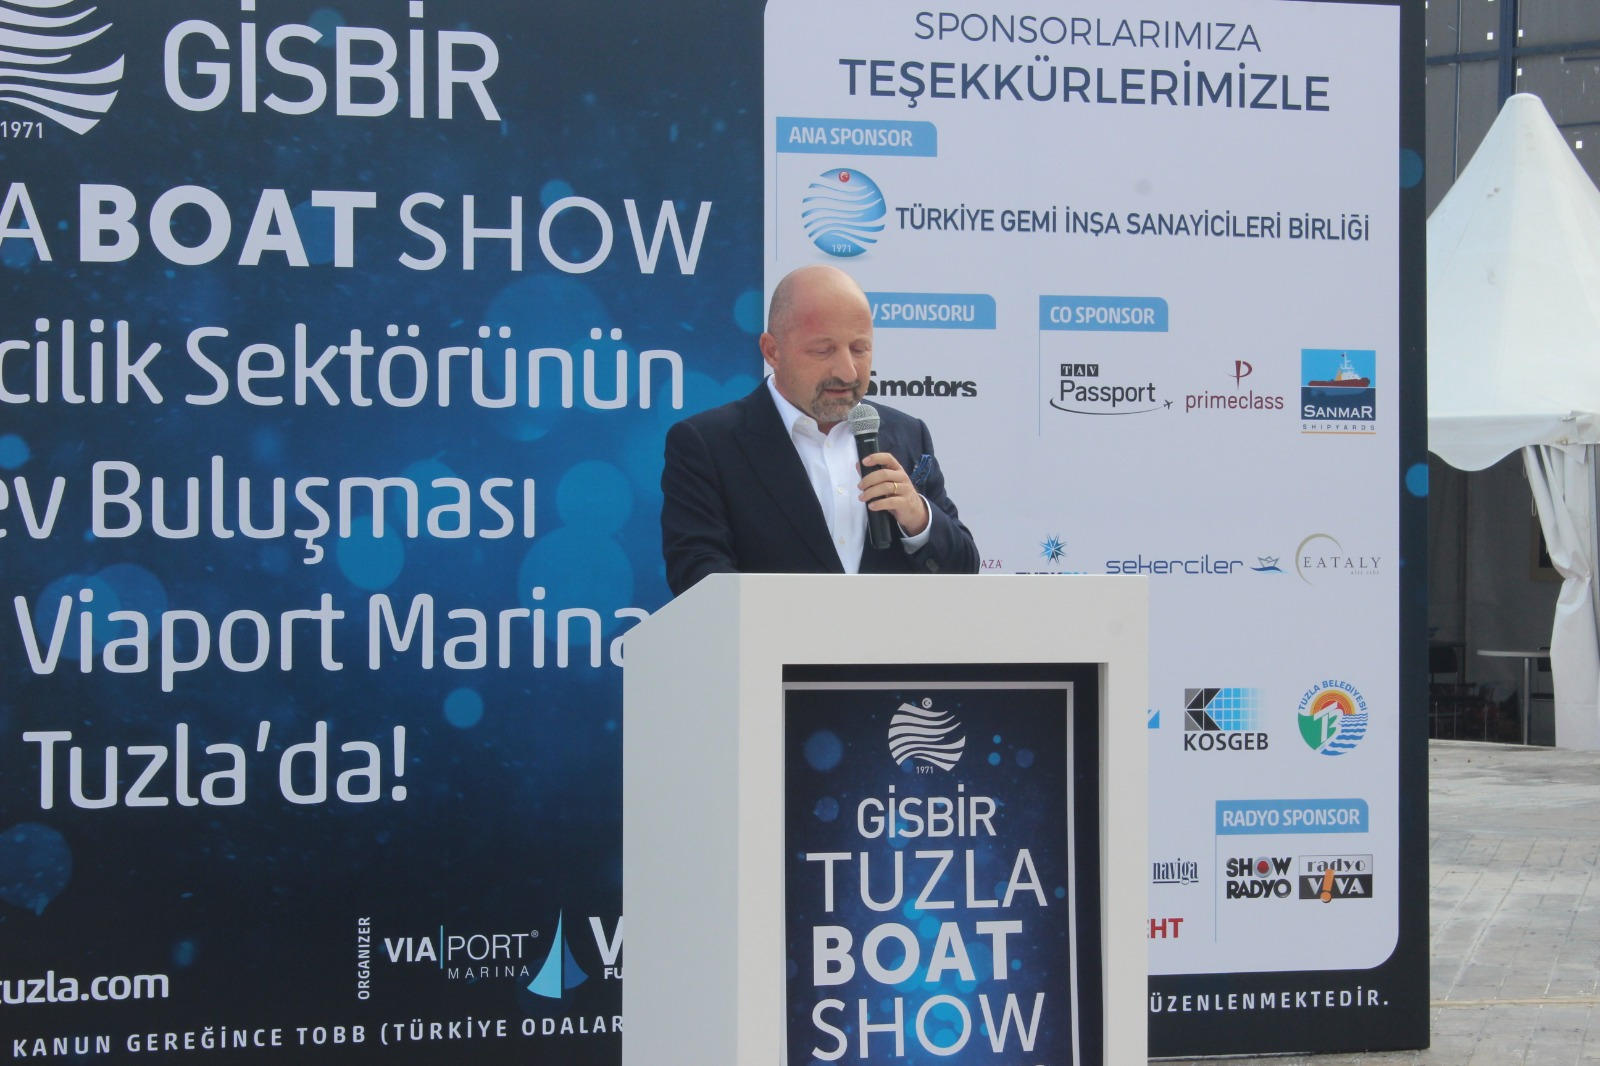 boat-show13.jpg